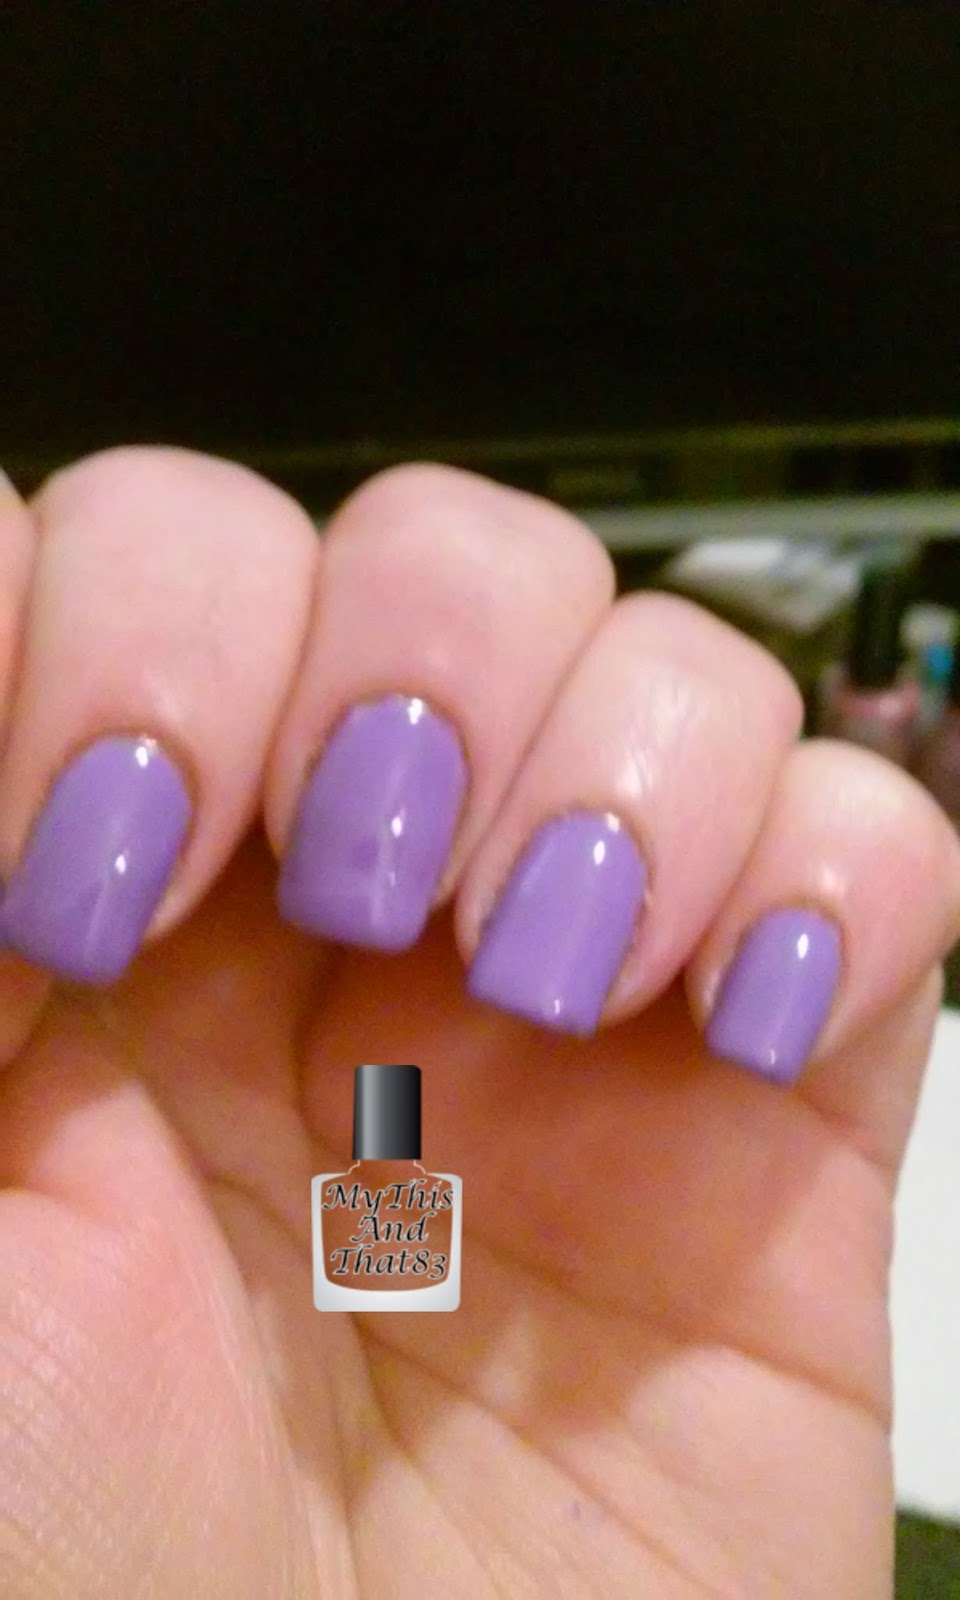 kleancolor nail polish pastel purple